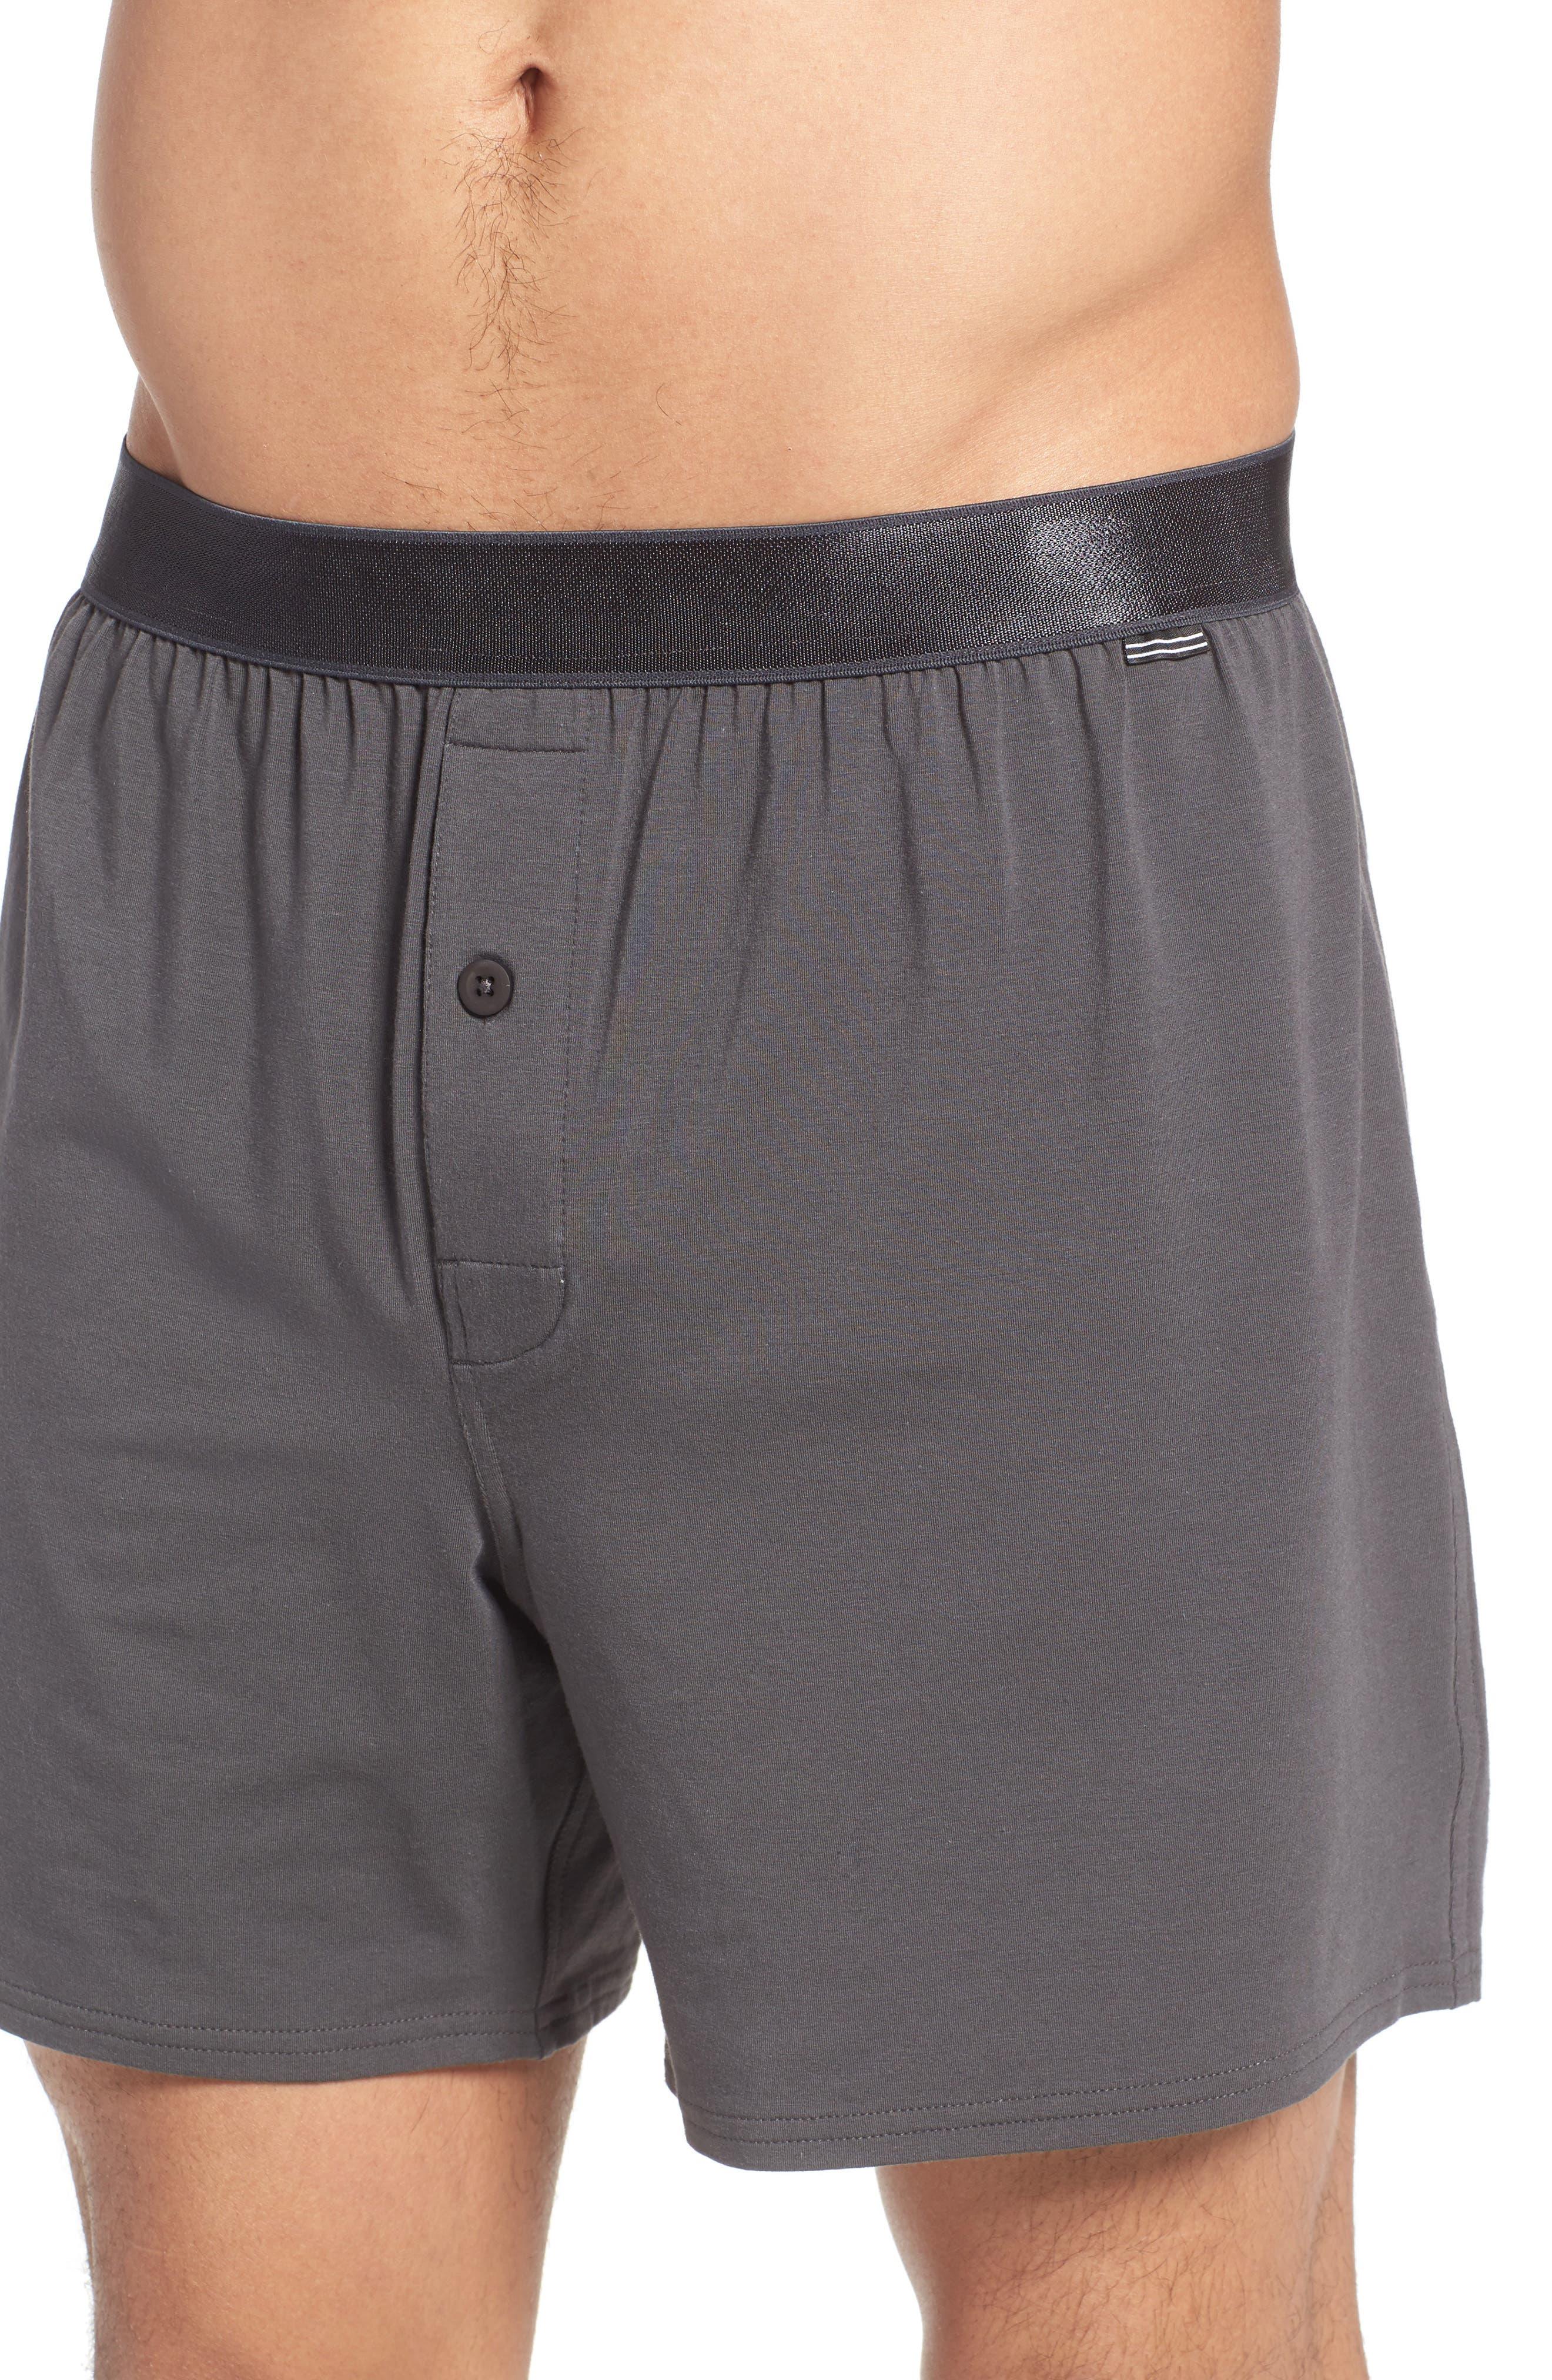 Micro Modal Blend Knit Boxers,                             Alternate thumbnail 4, color,                             Graphite Grey